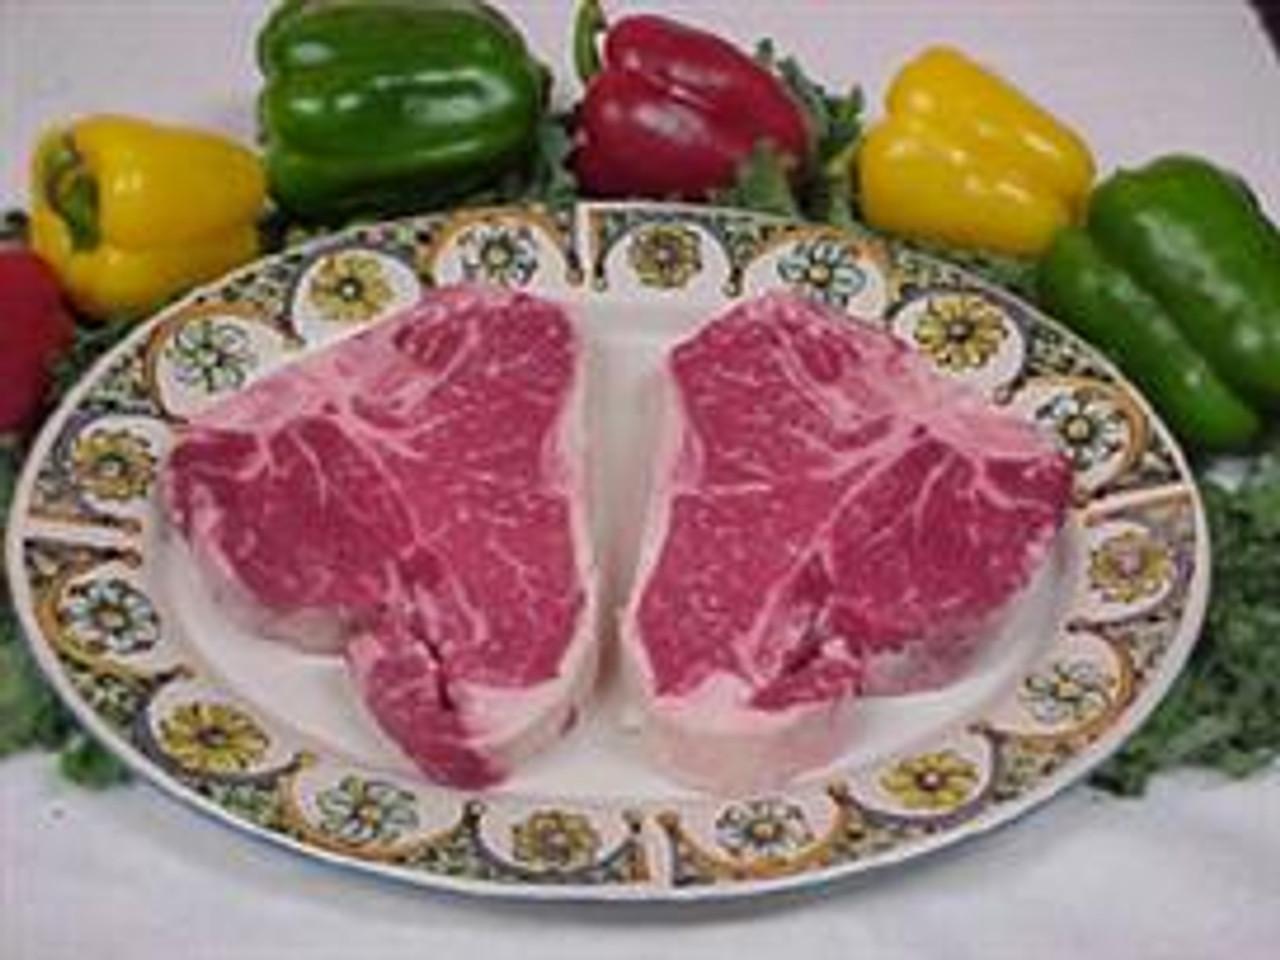 U.S.D.A. Black Angus Porterhouse Steak